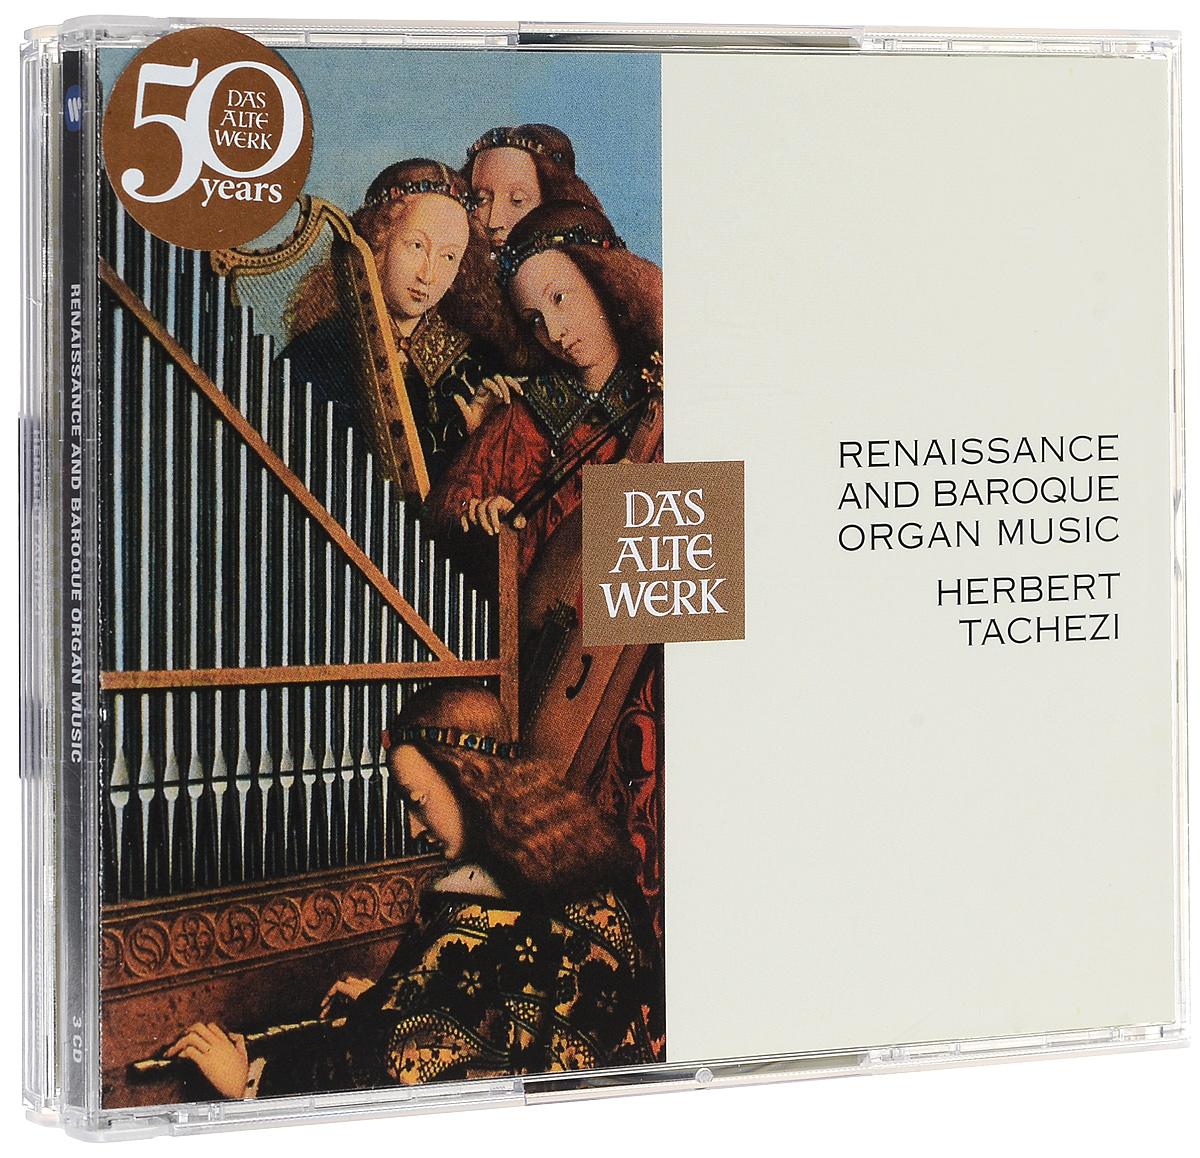 Херберт Ташеци Das Alte Werk. Herbert Tachezi. Renaissance And Baroque Organ Music (3 CD) херберт ташеци das alte werk herbert tachezi renaissance and baroque organ music 3 cd